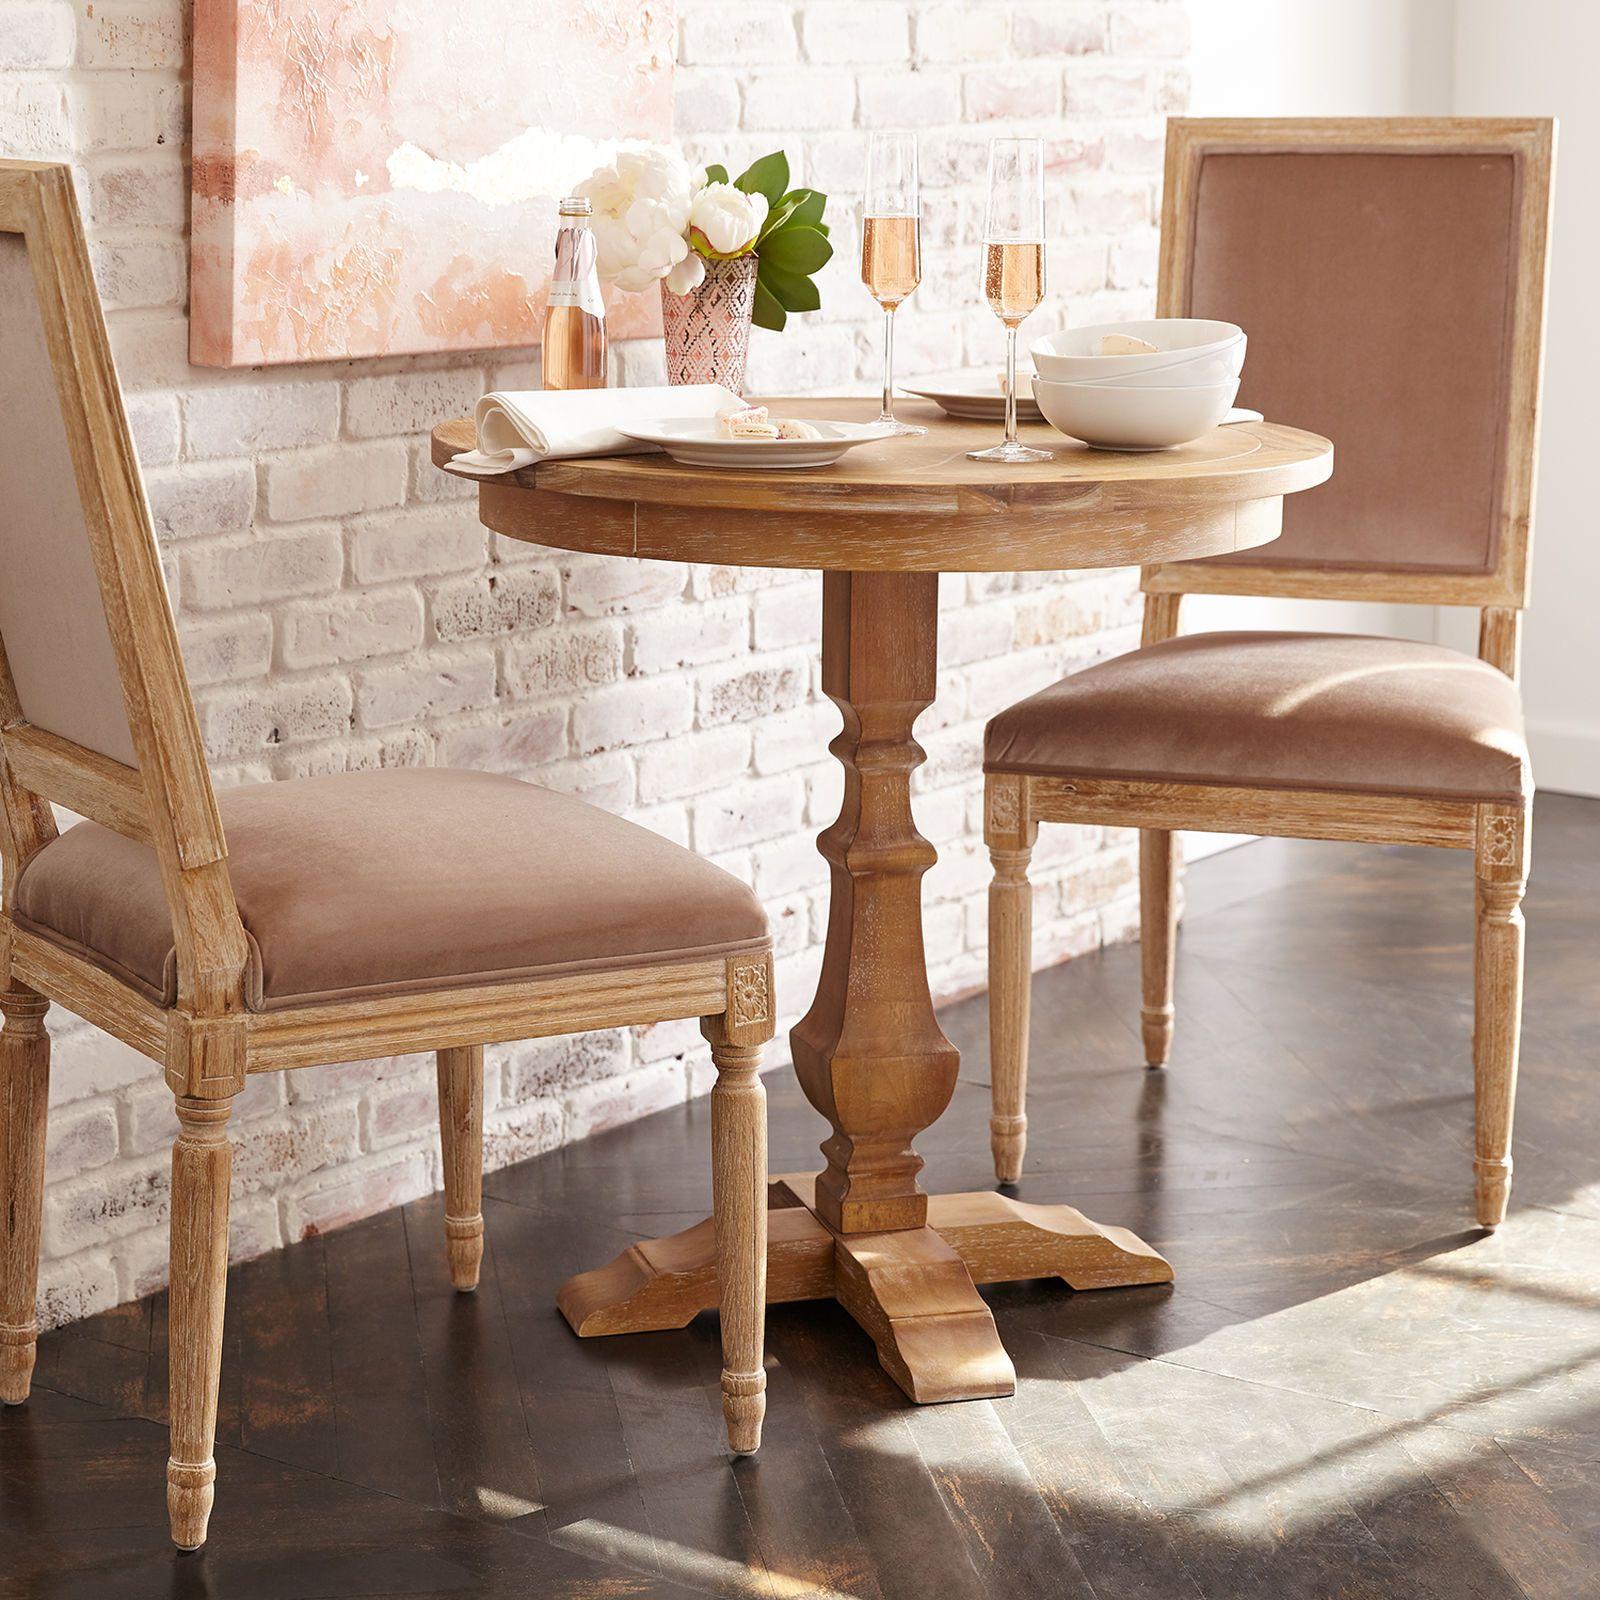 Bradding Natural Stonewash 30 Bistro Table Pier 1 Imports Dining Room Table Dining Room Small Bistro Table Set